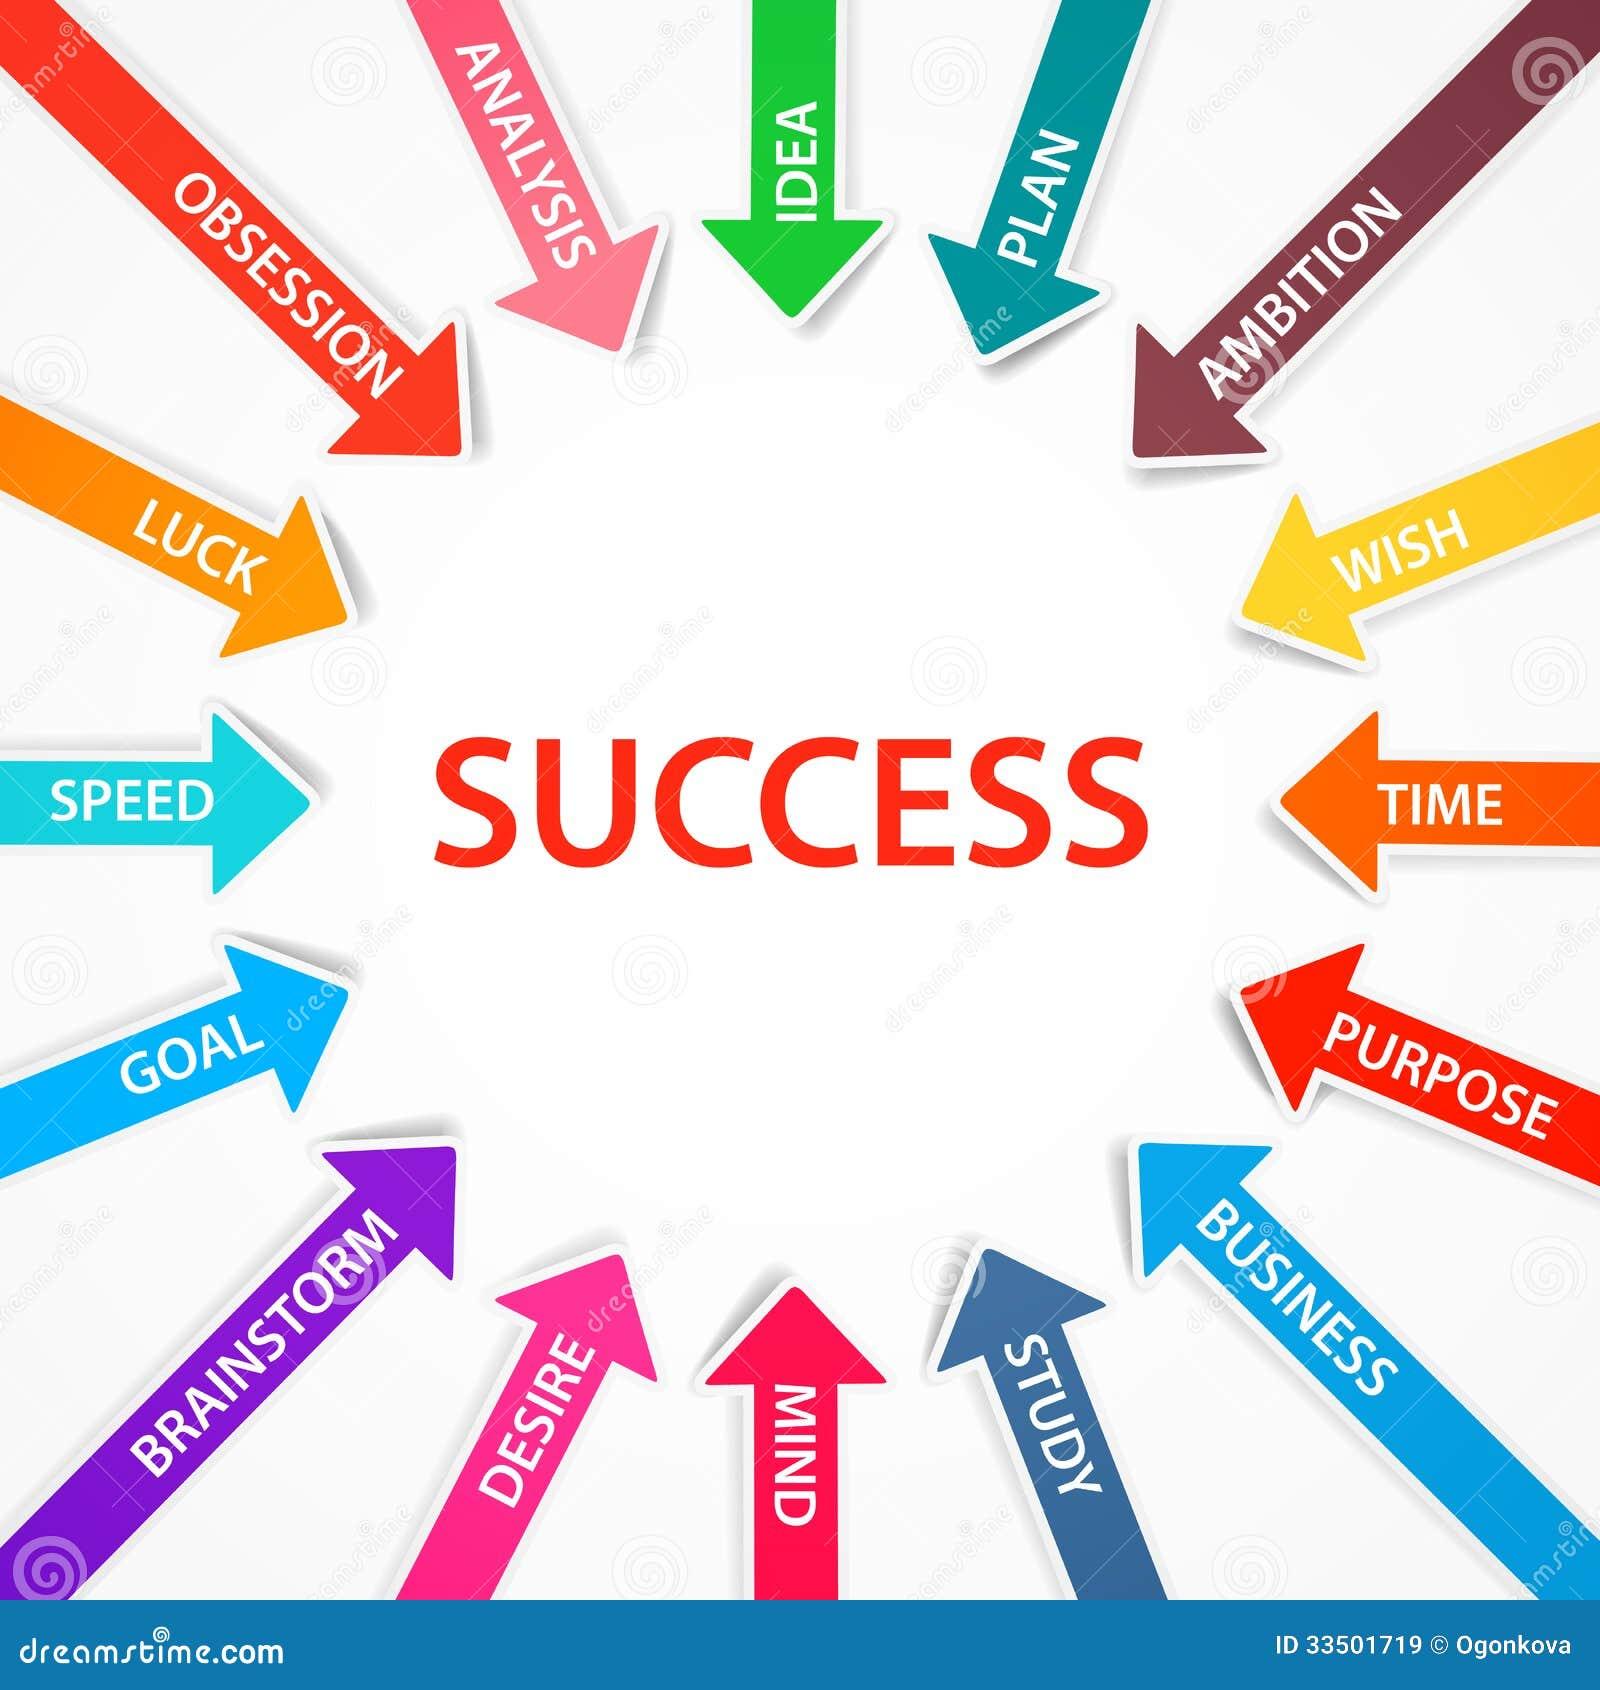 Strategies to success